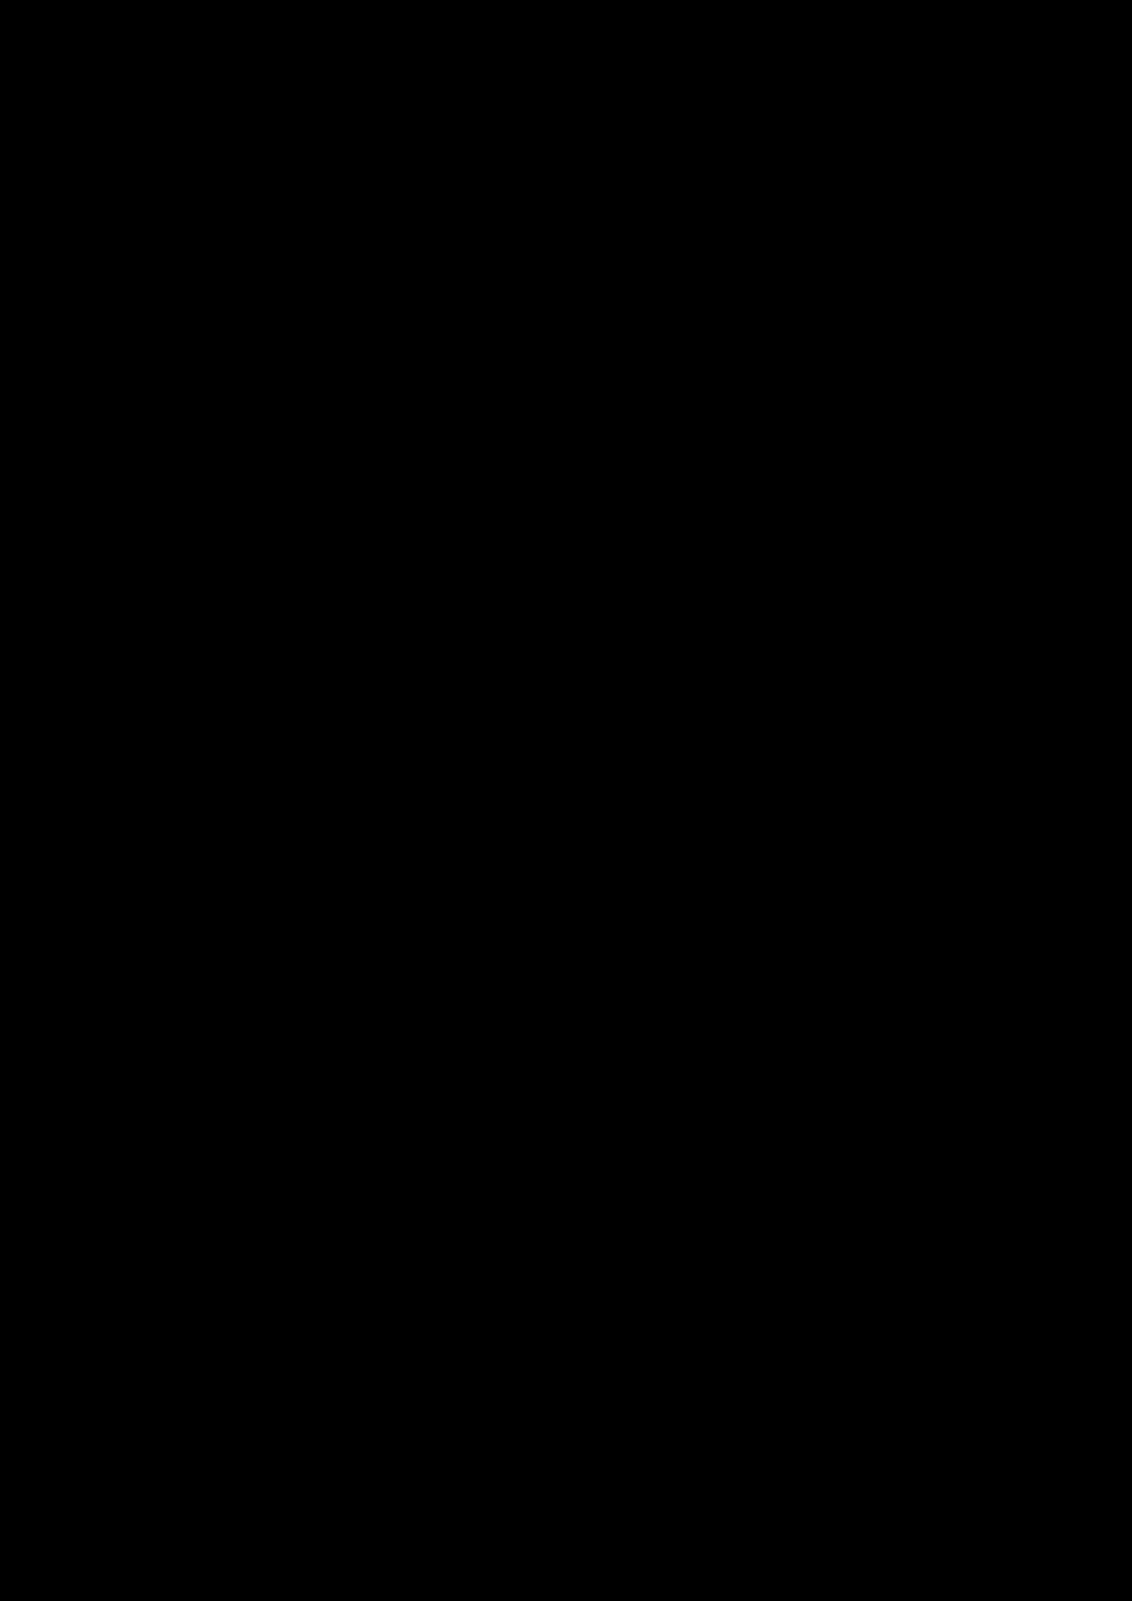 Korolevstvo slez slide, Image 85